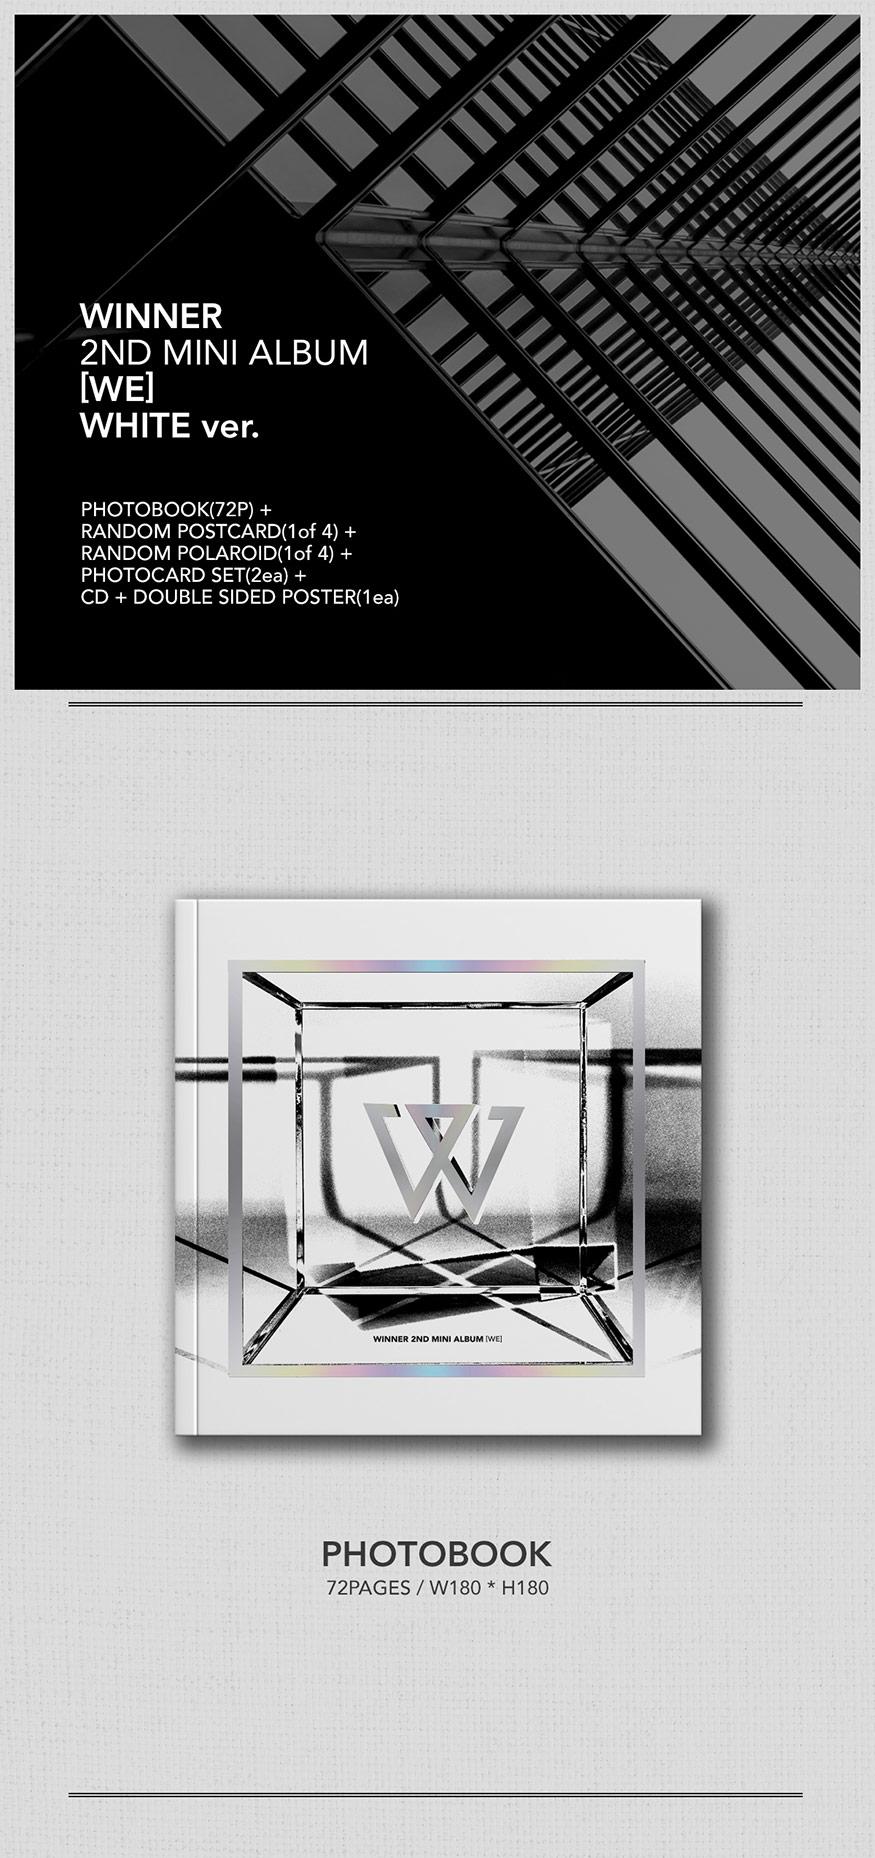 winner_WE_white-1